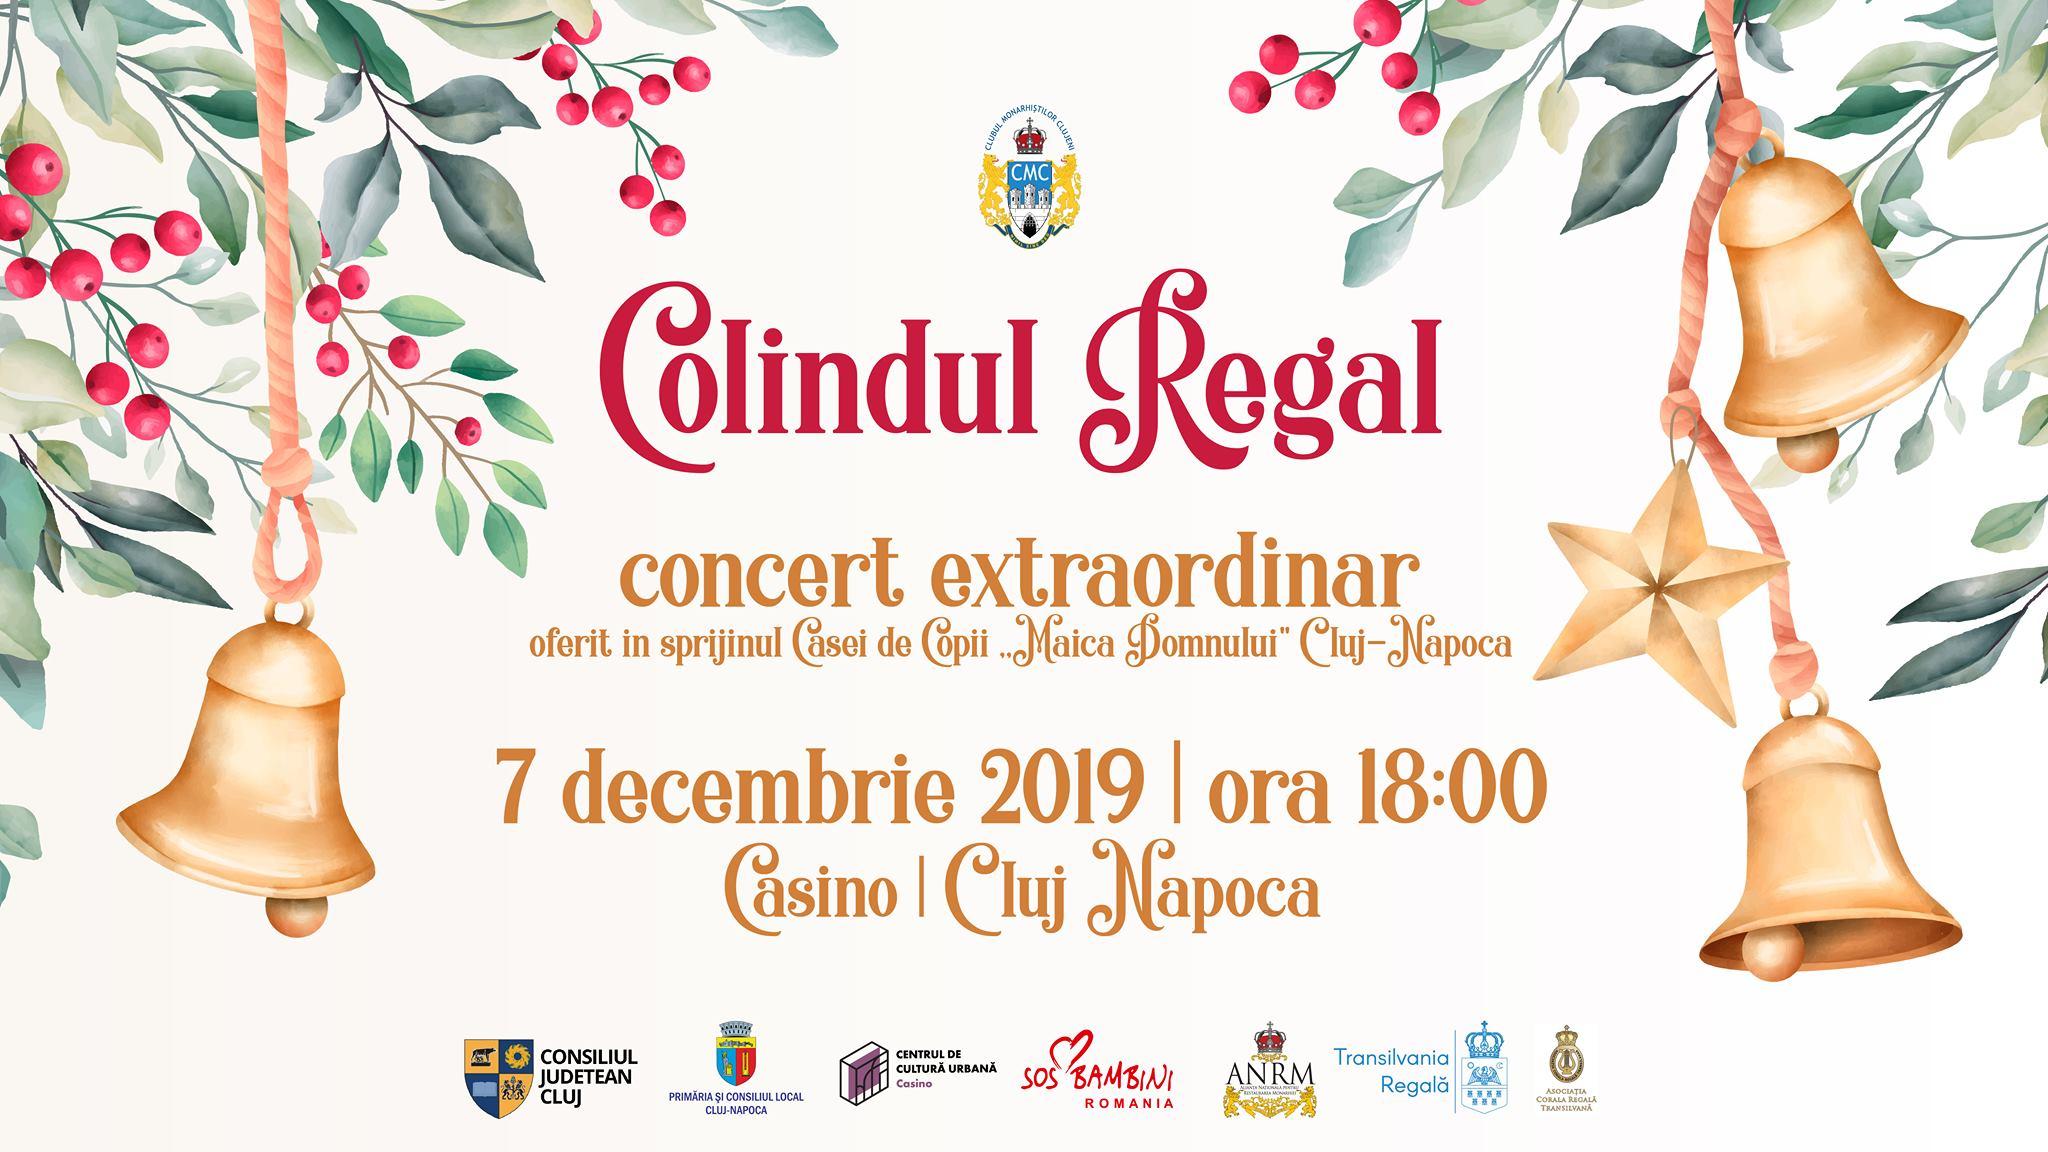 Concert Caritabil: Colindul Regal 2019